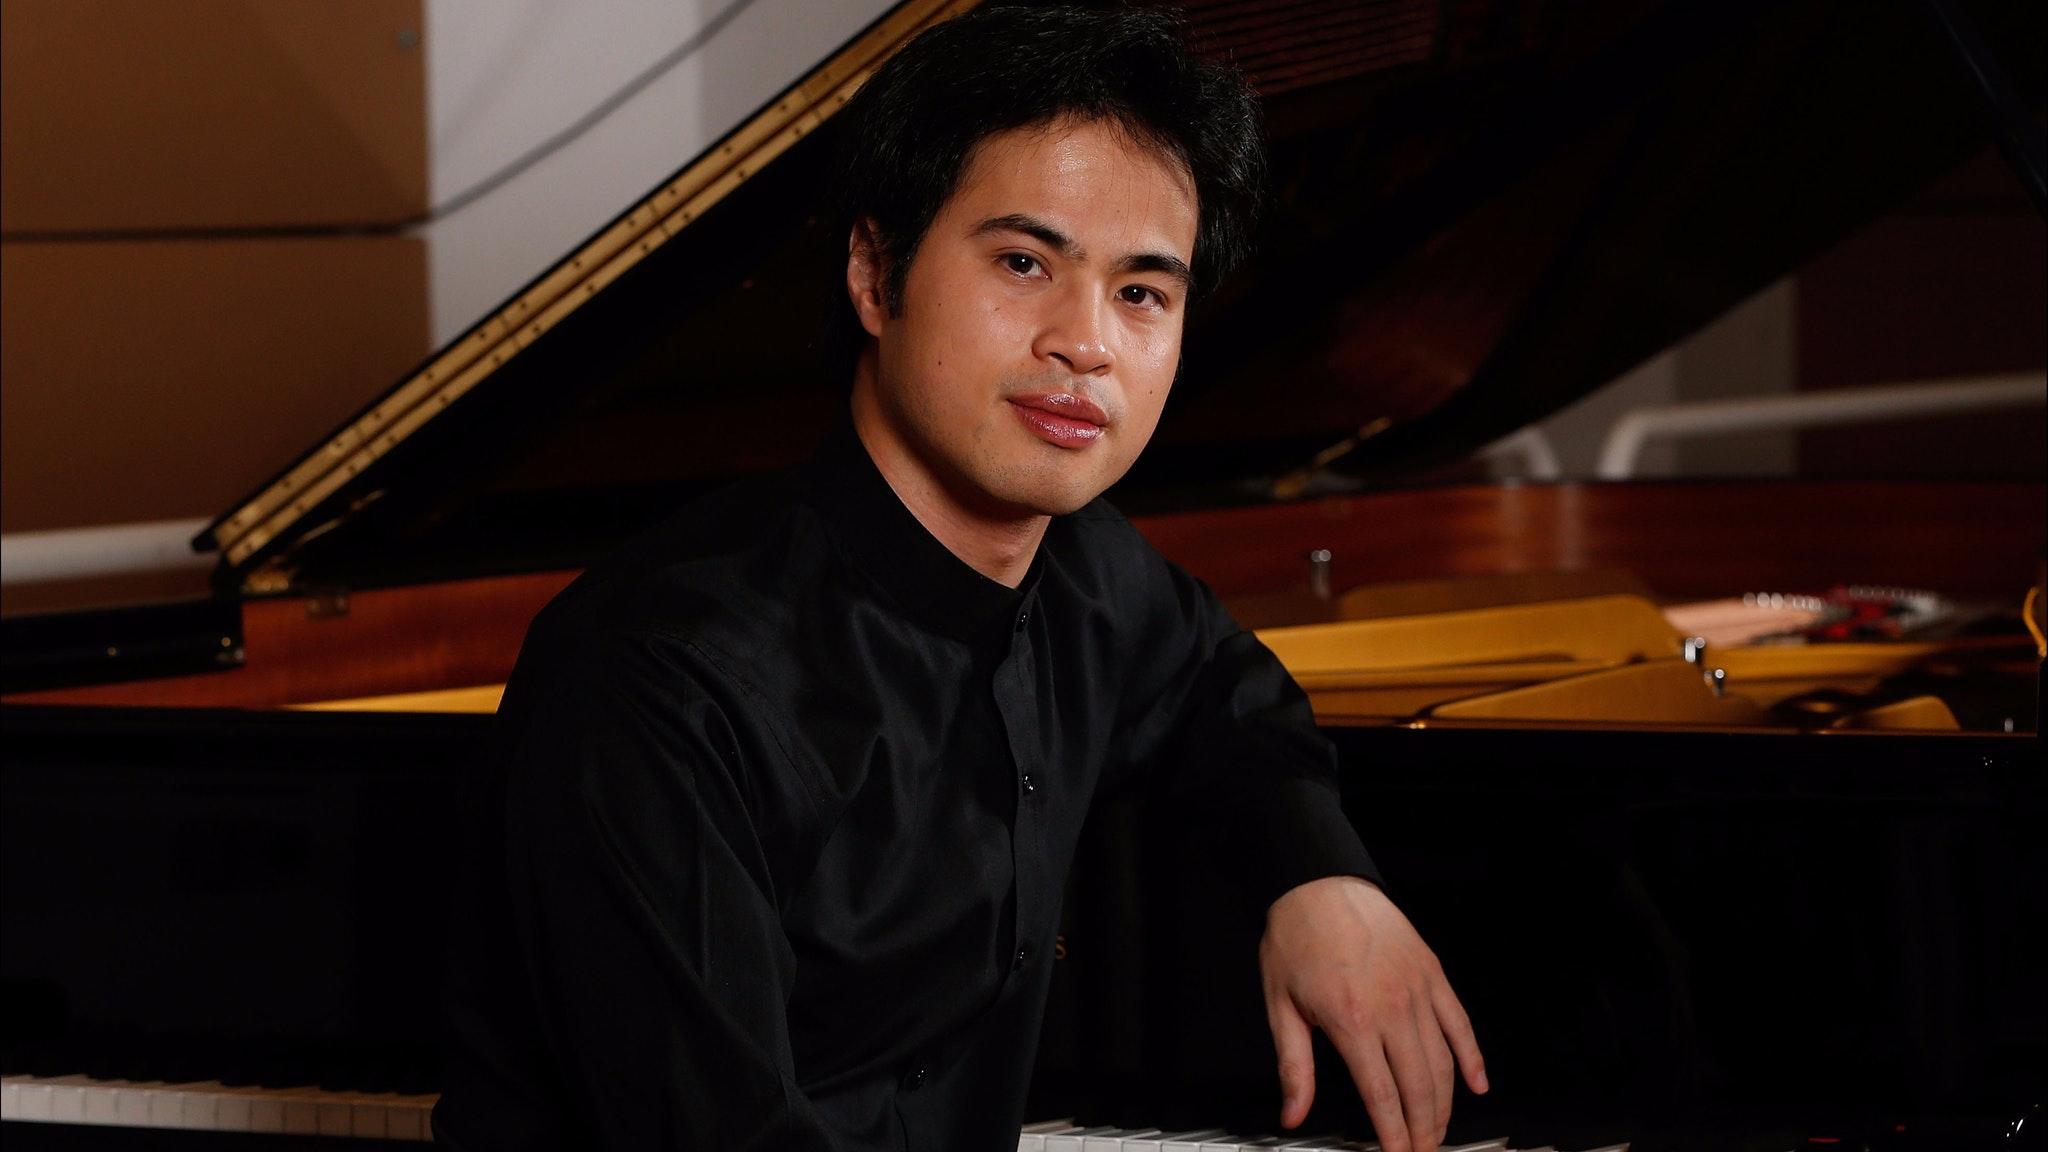 Hoang Pham Concert Pianist